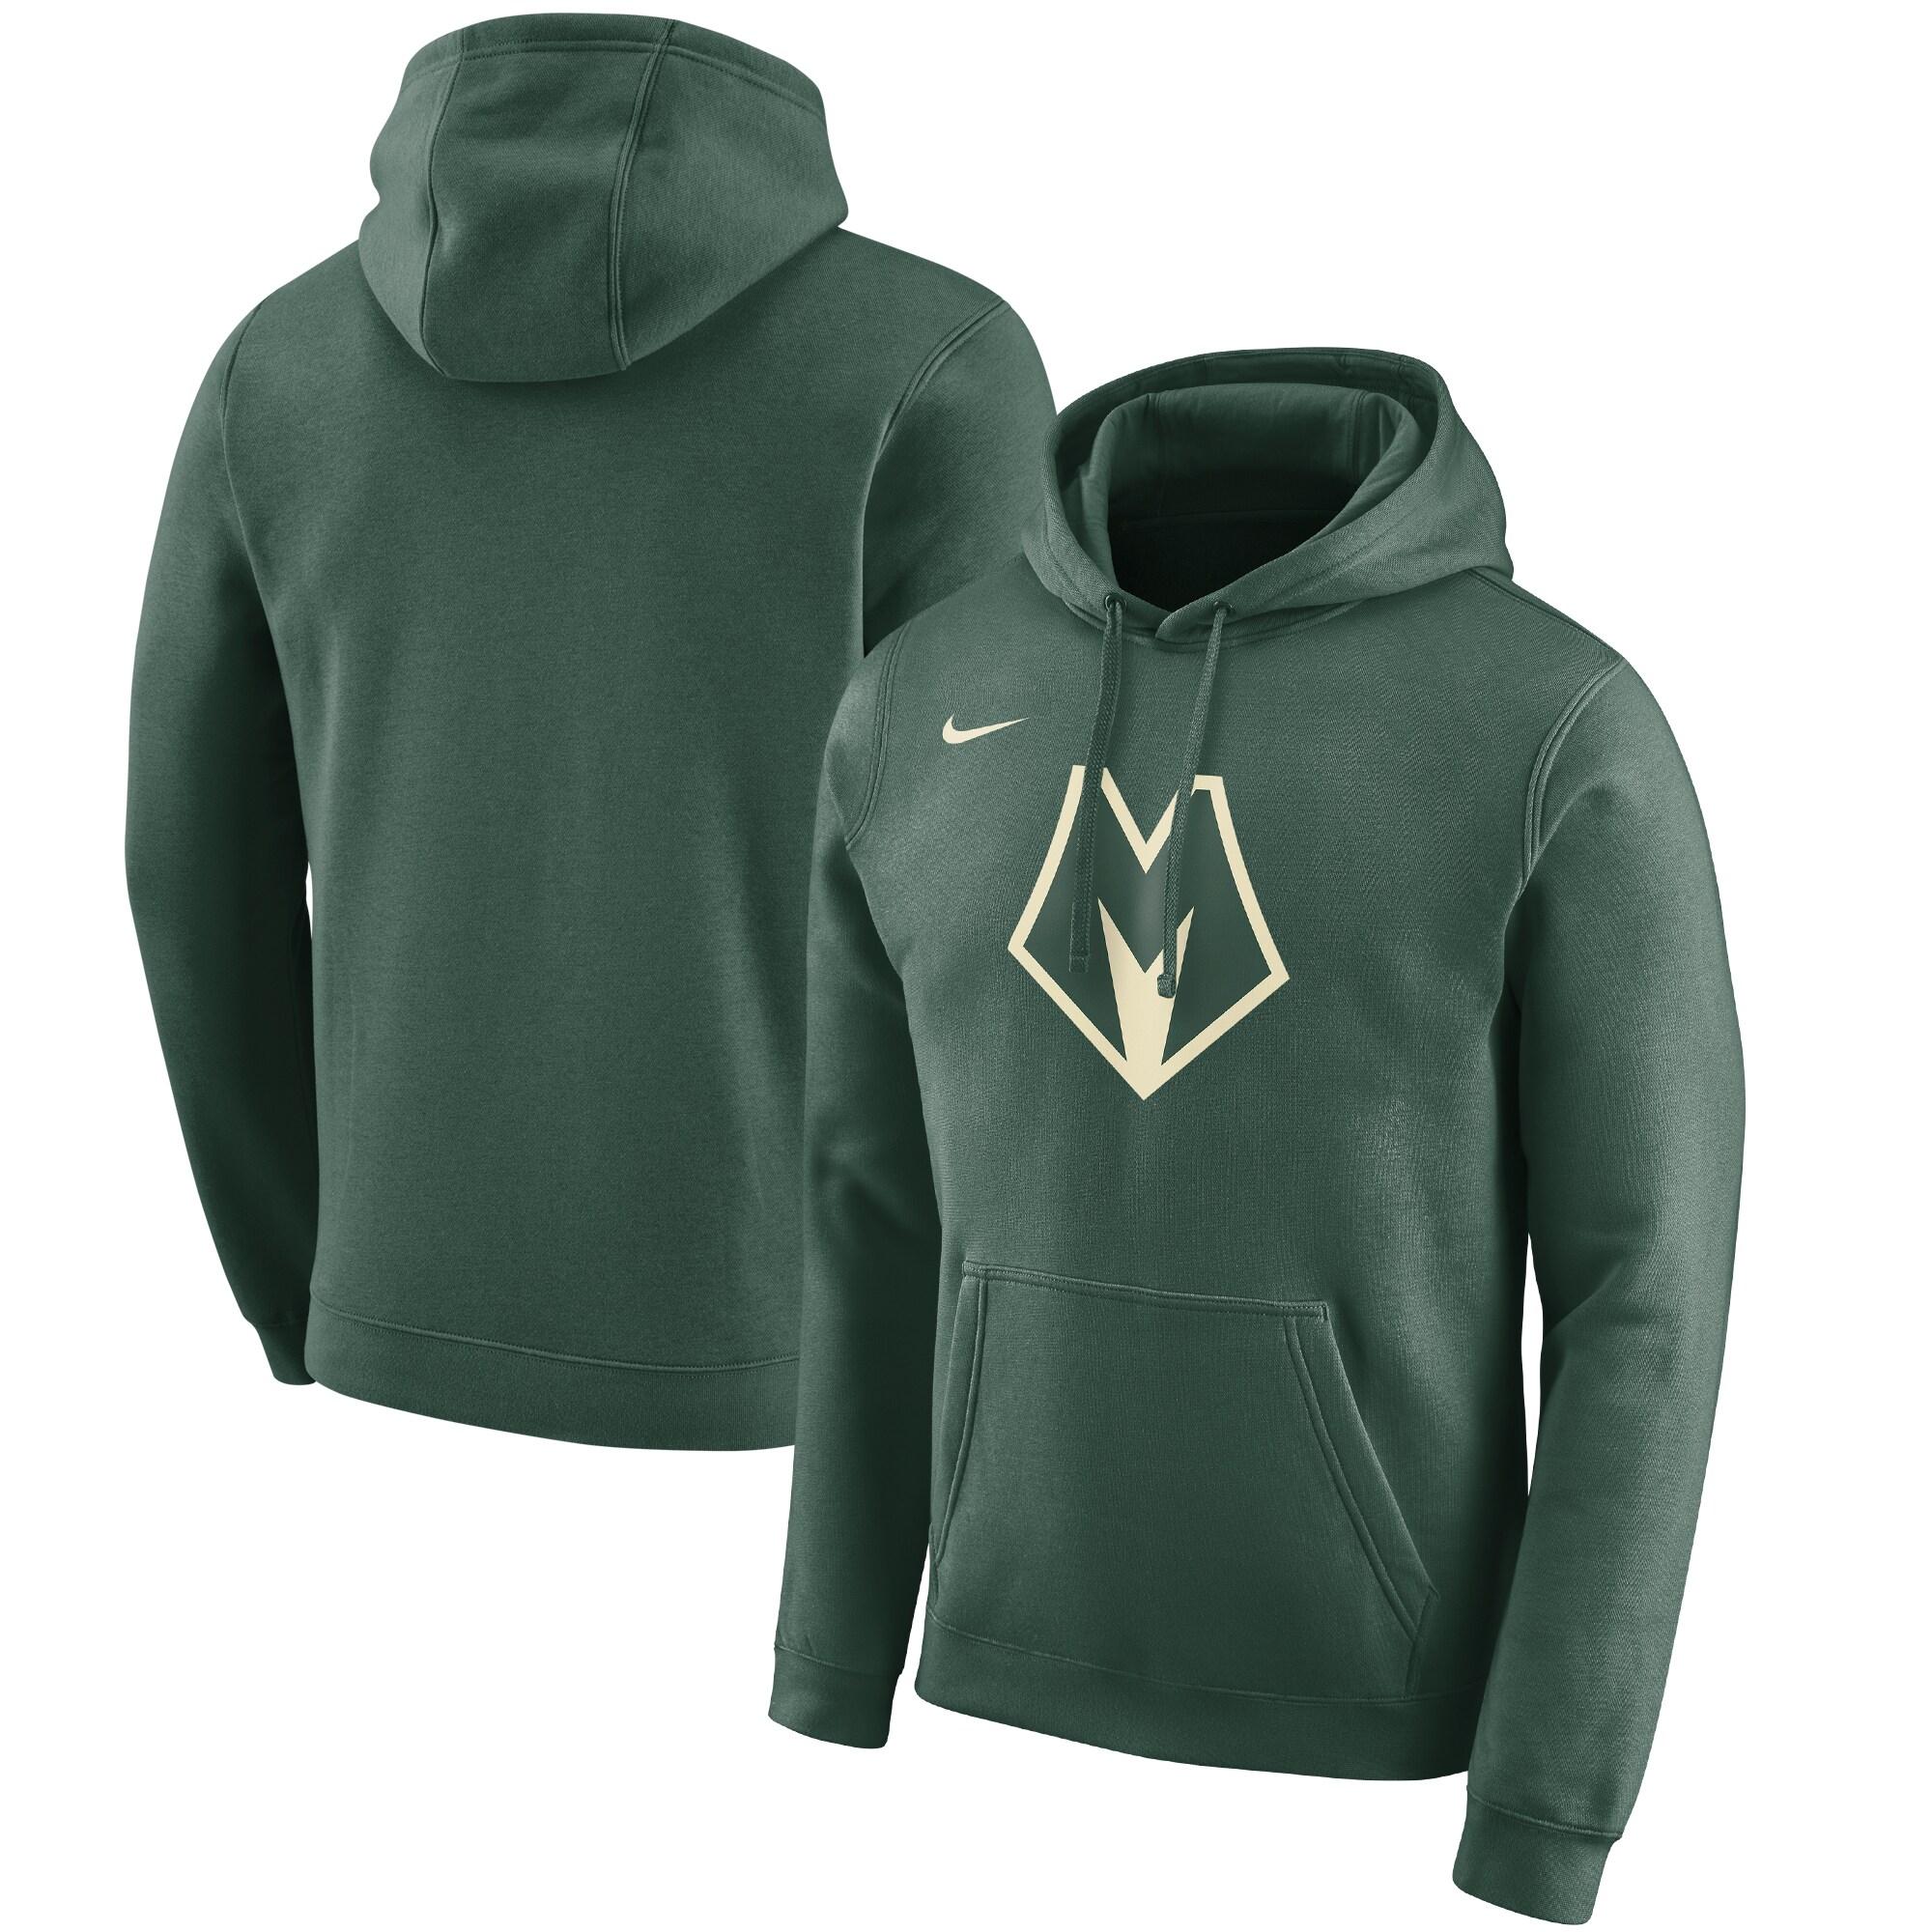 Milwaukee Bucks Nike 2019/20 City Edition Club Pullover Hoodie - Green